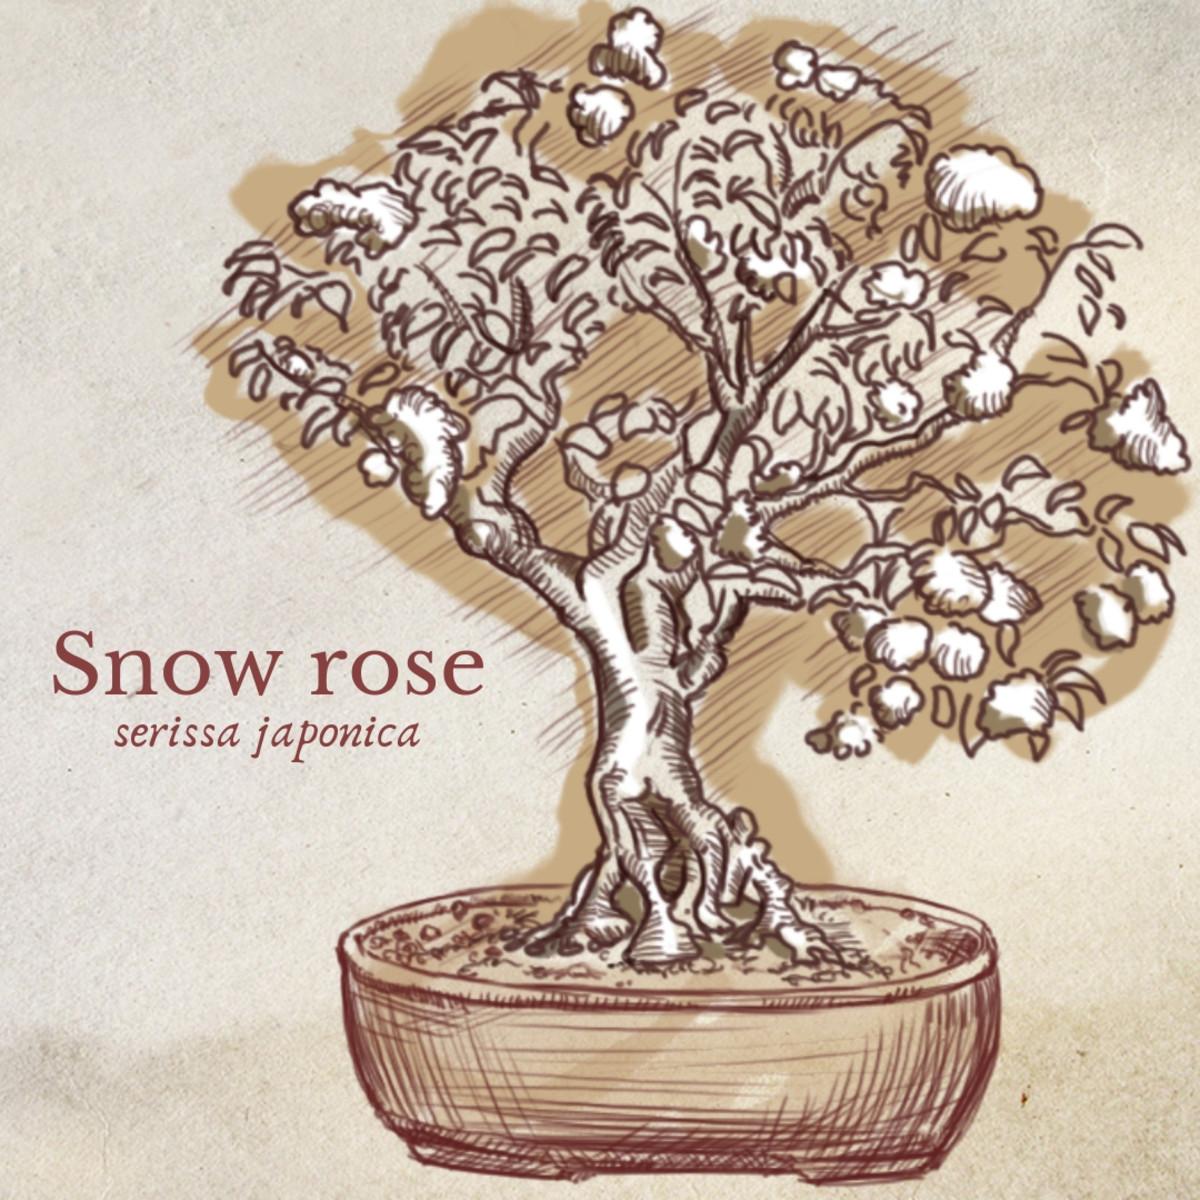 Illustration of Snow Rose